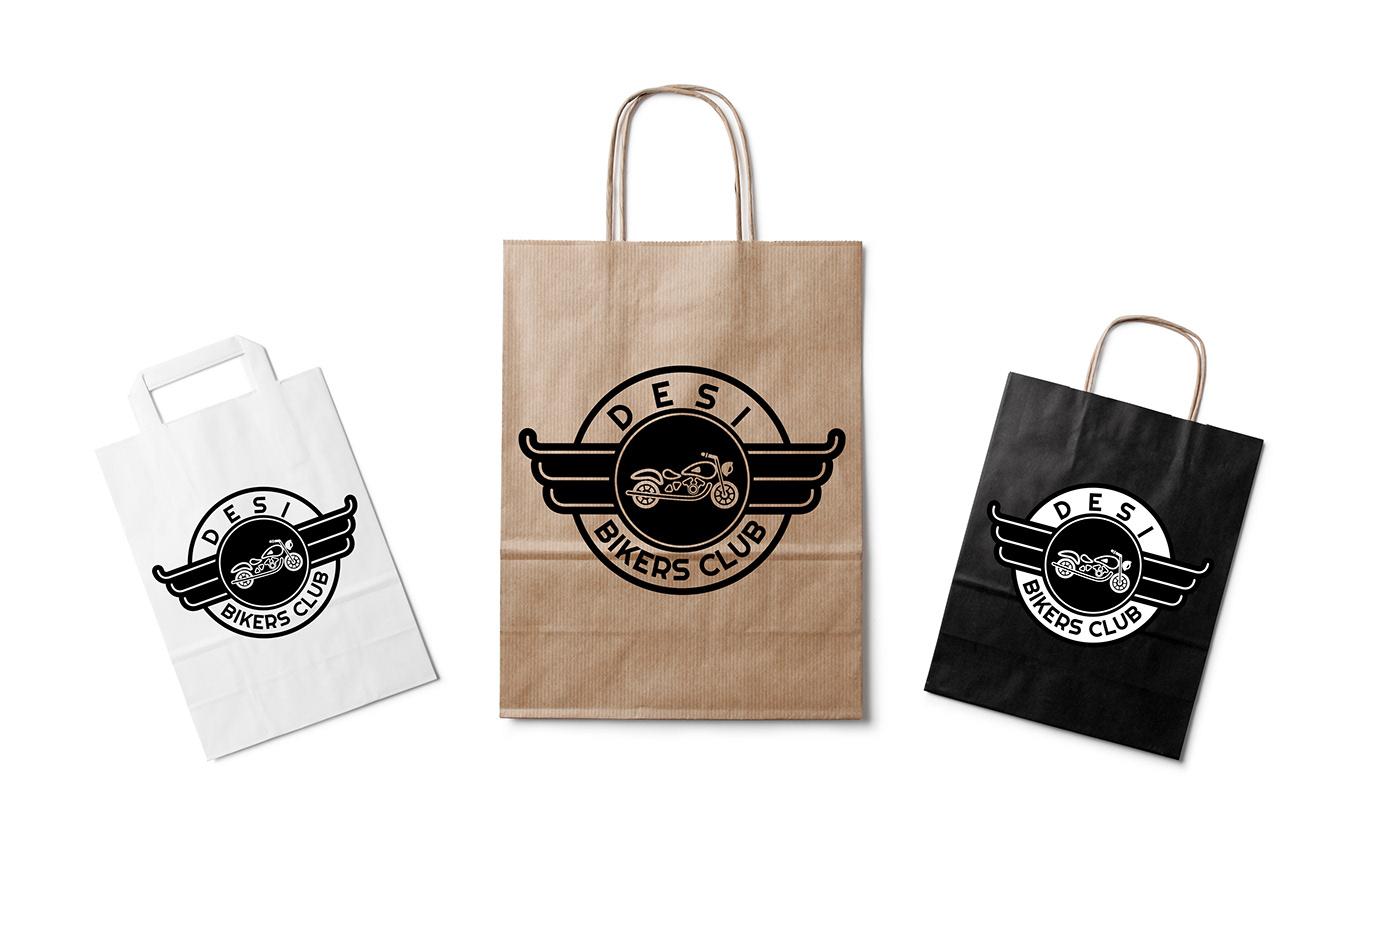 adobe photoshop Illustrator logo branding  print tshirt business card biking motorcycle